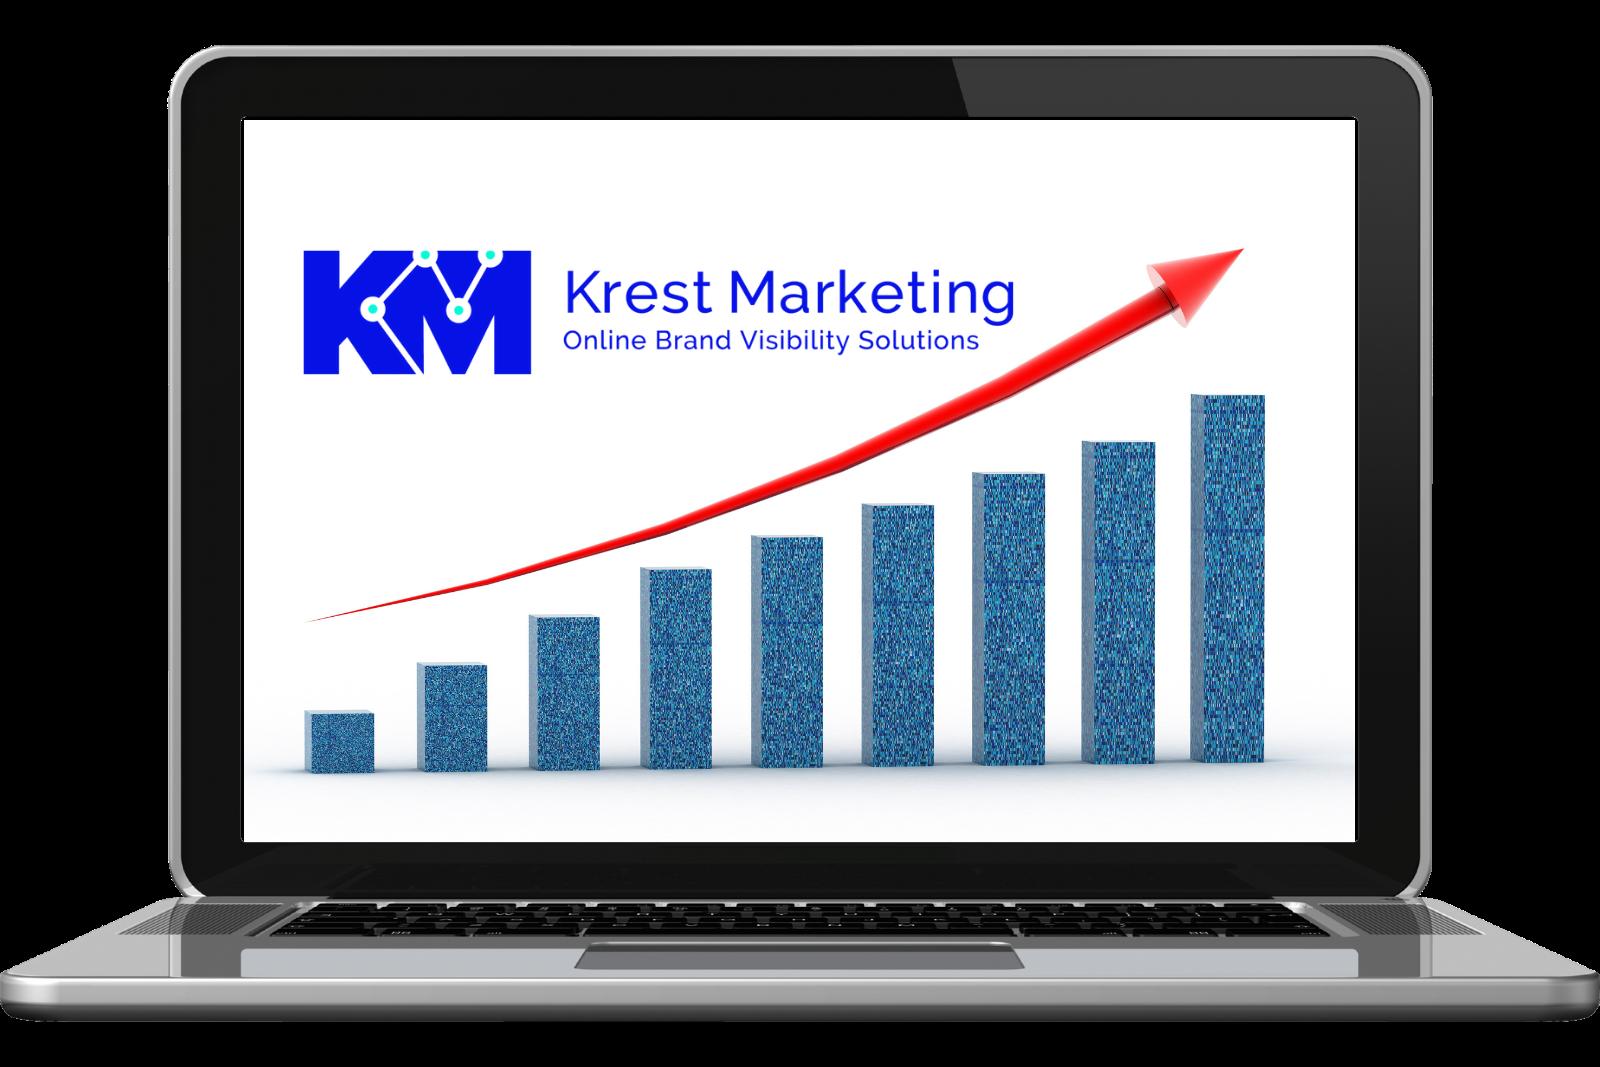 Krest Marketing Contact Us Cta Image